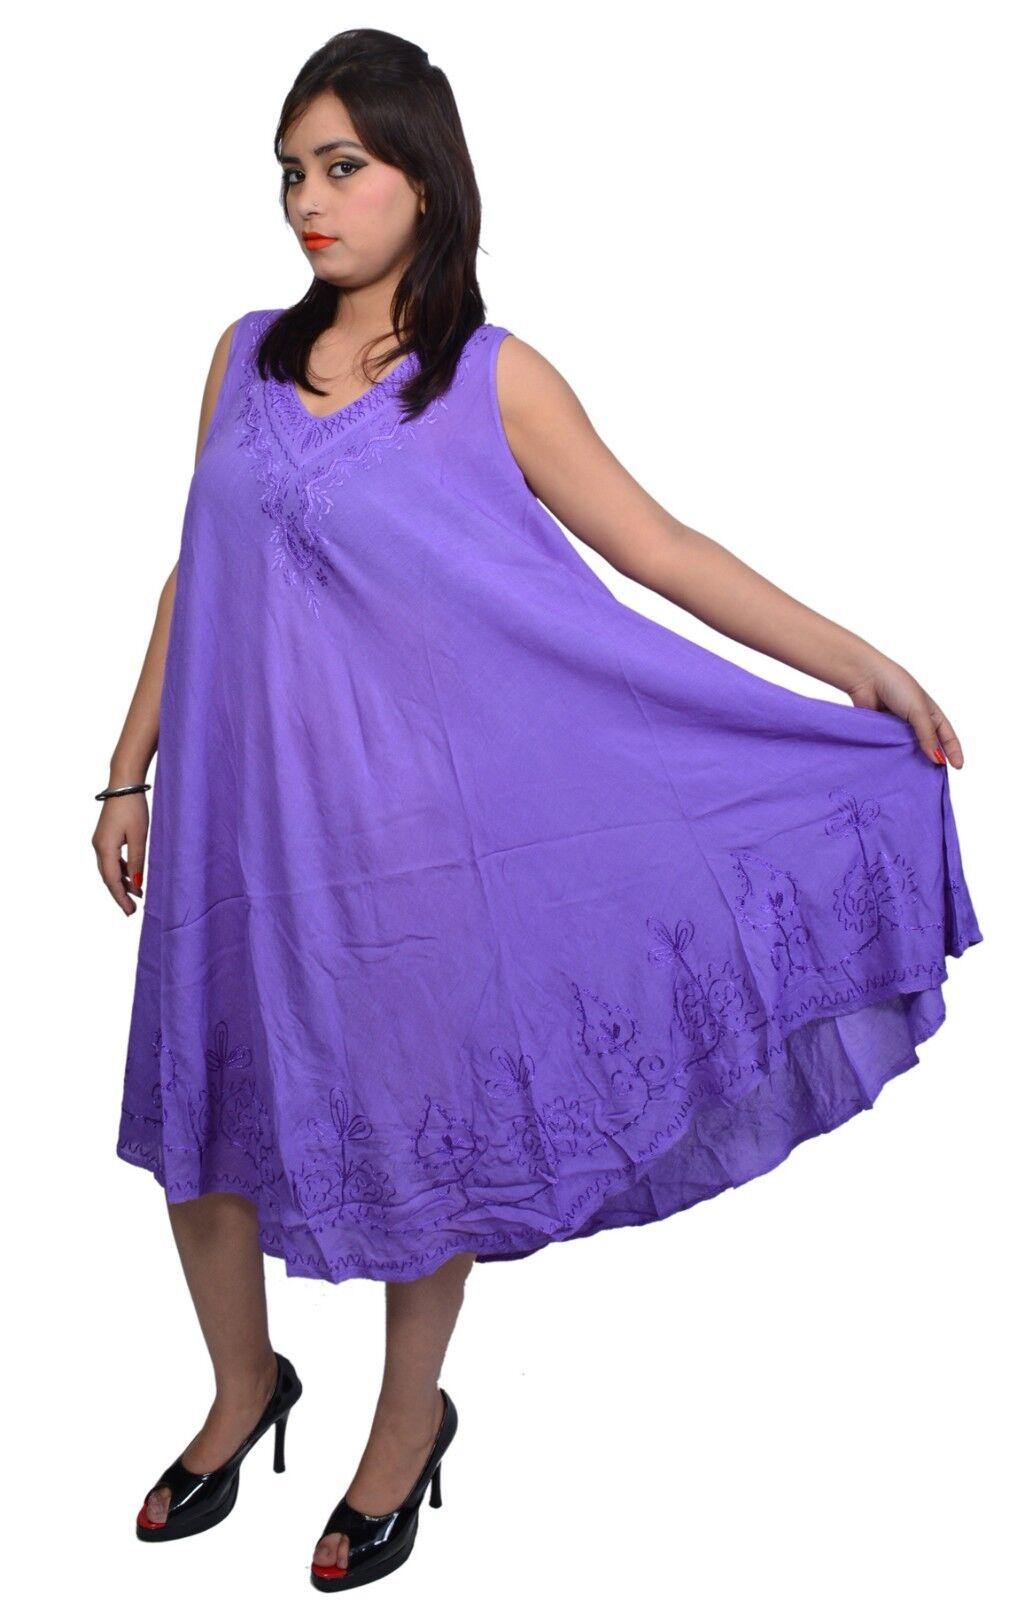 WHOLESALE LOT OF 40 Maxi dresses BABYDOL Plain